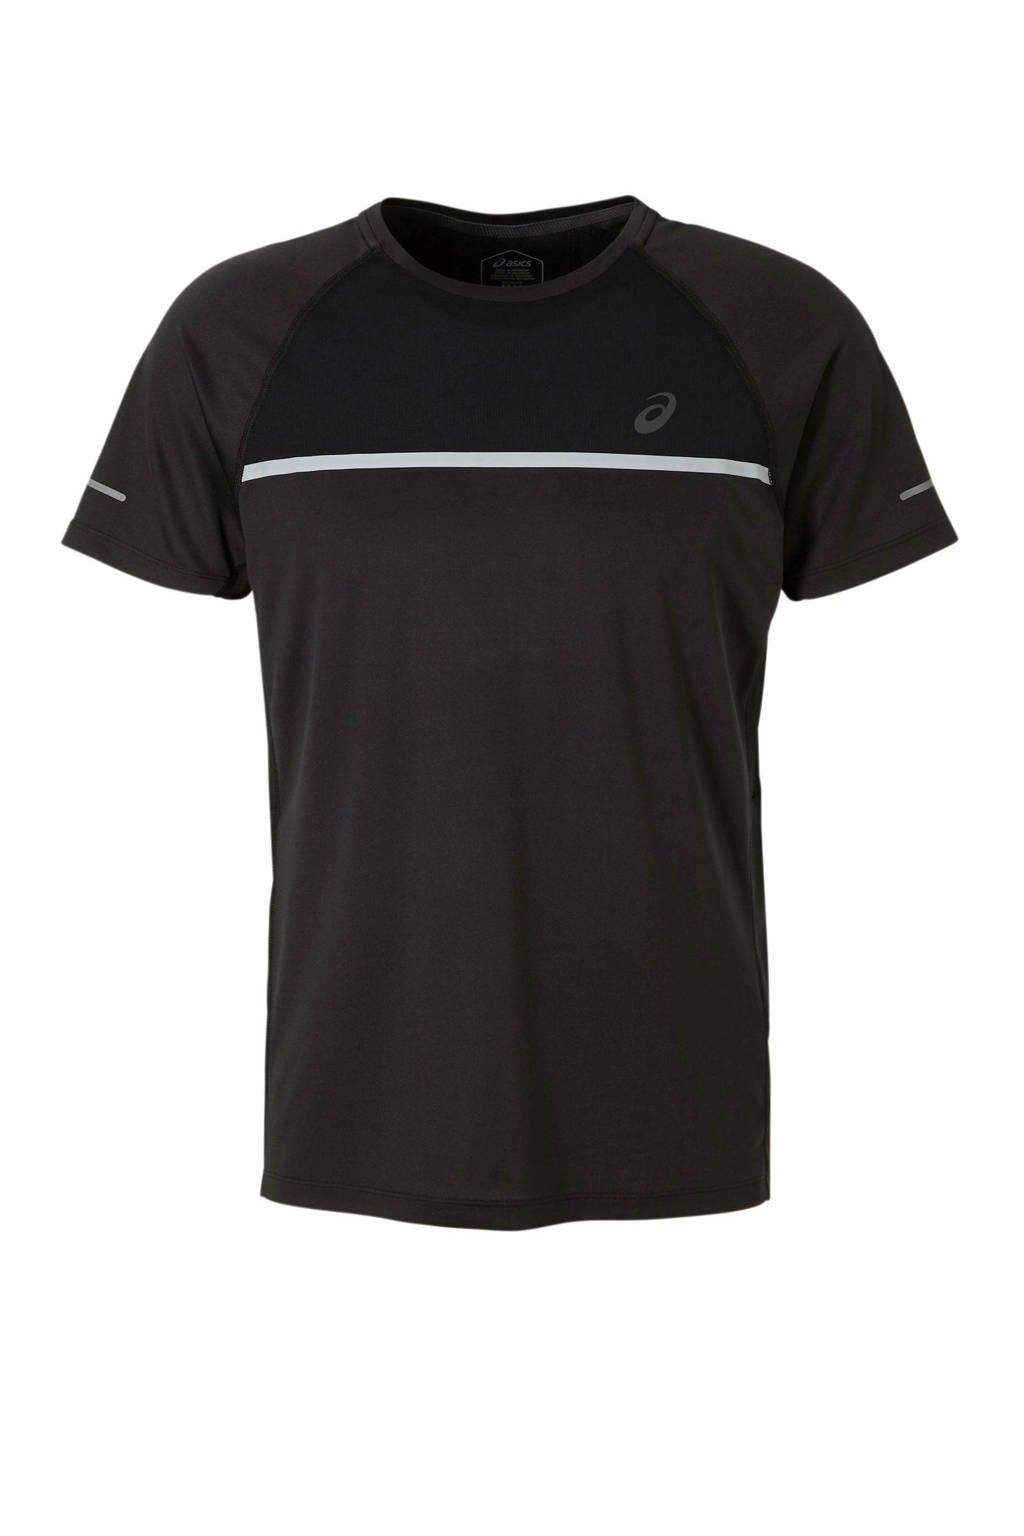 ASICS   hardloop T-shirt zwart, Zwart